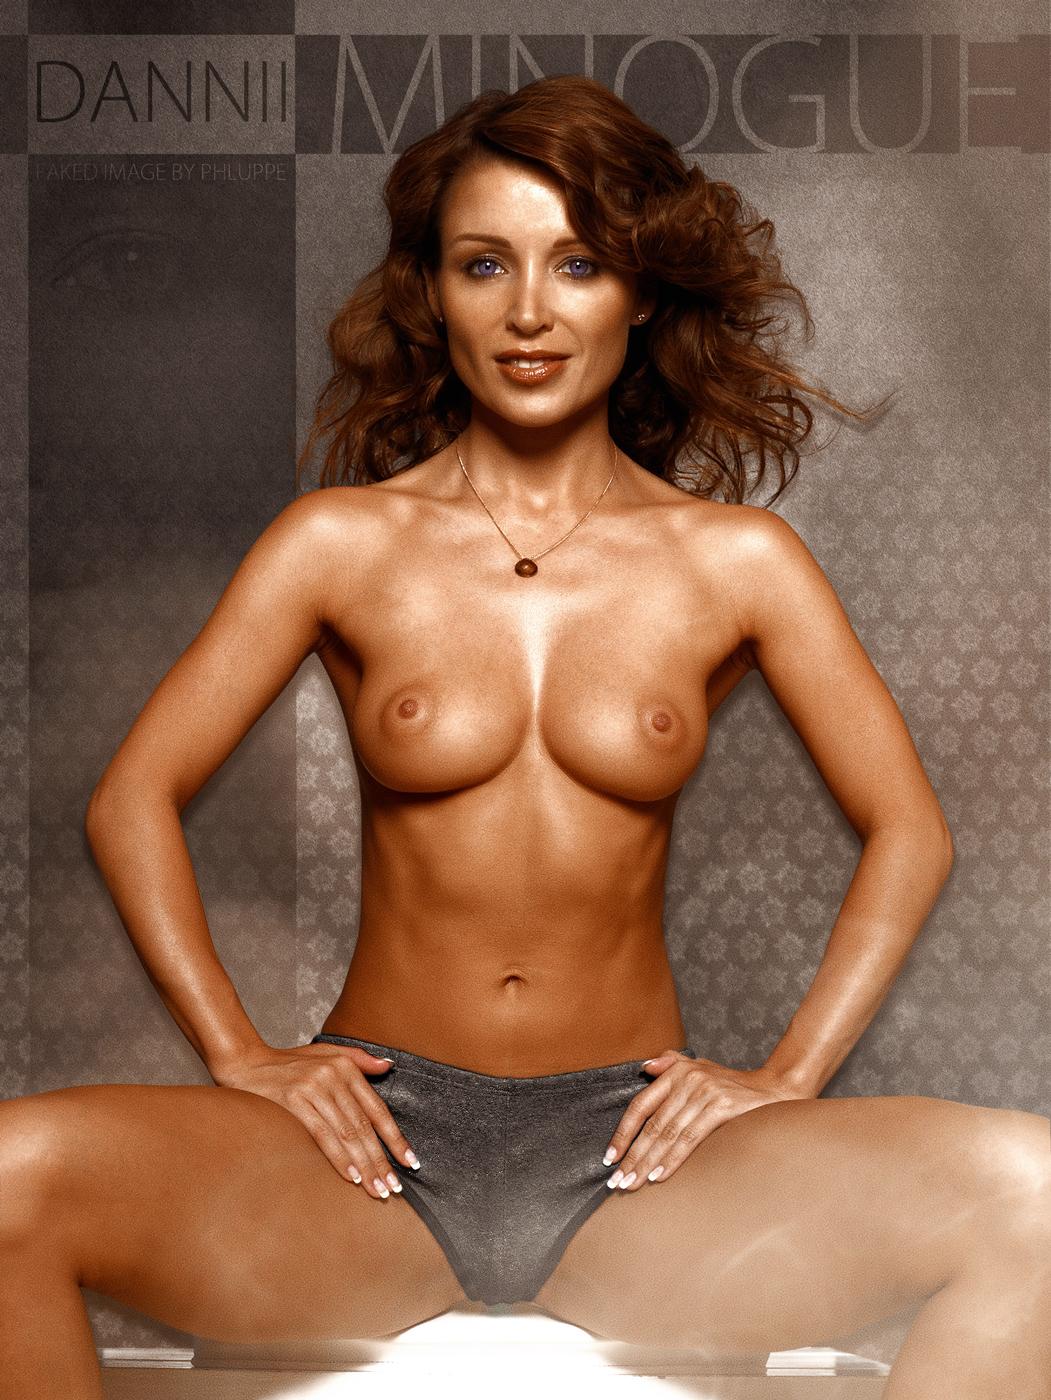 dannii minogue nude pictures